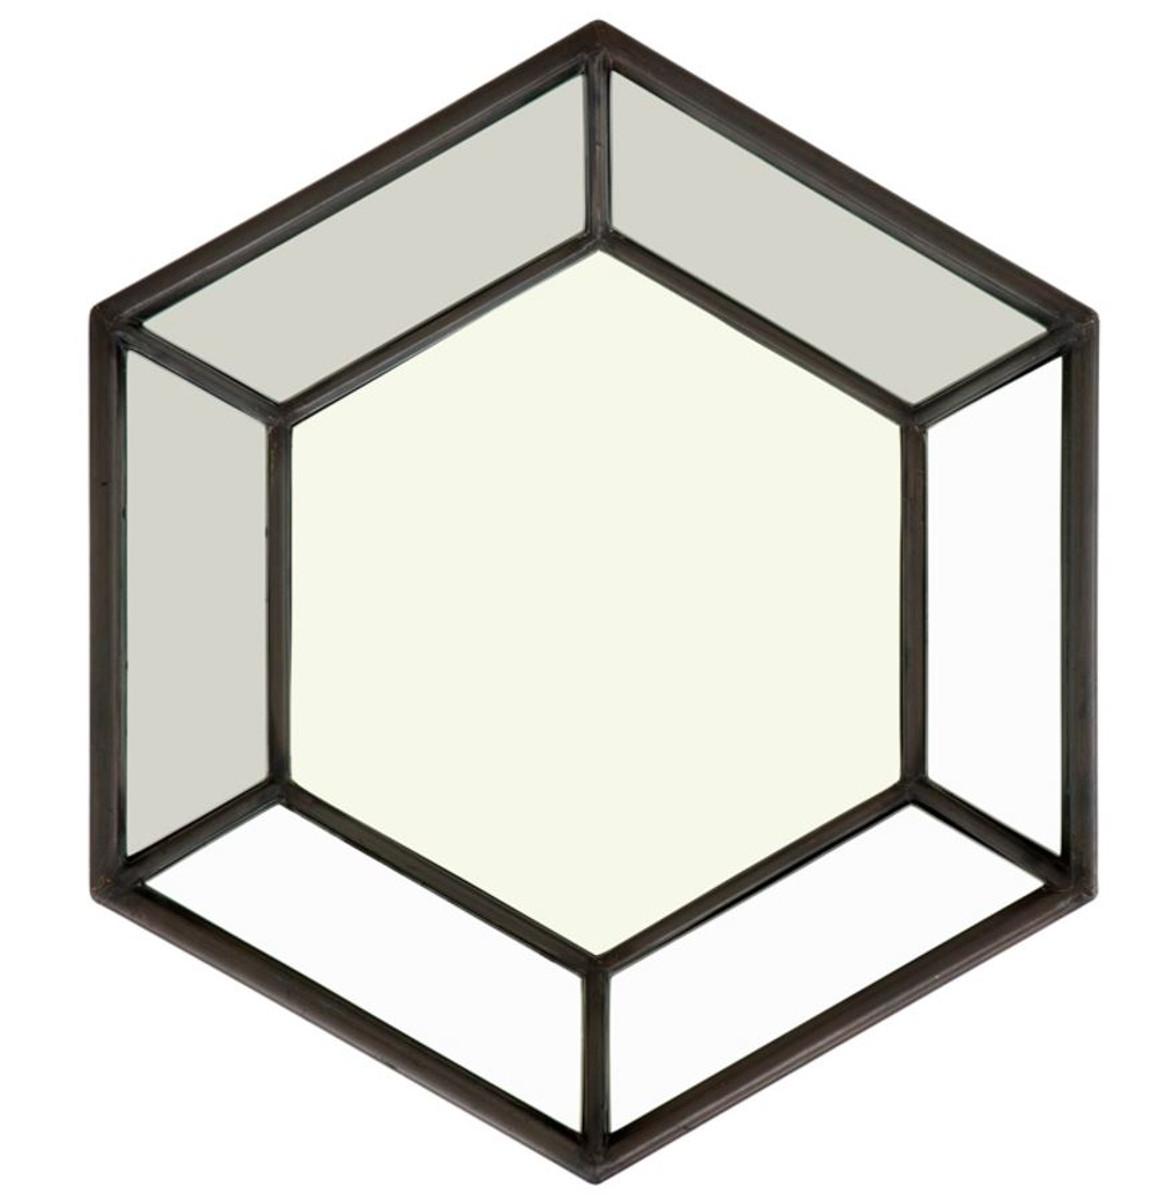 casa padrino luxus spiegel 6er set designer wandspiegel. Black Bedroom Furniture Sets. Home Design Ideas